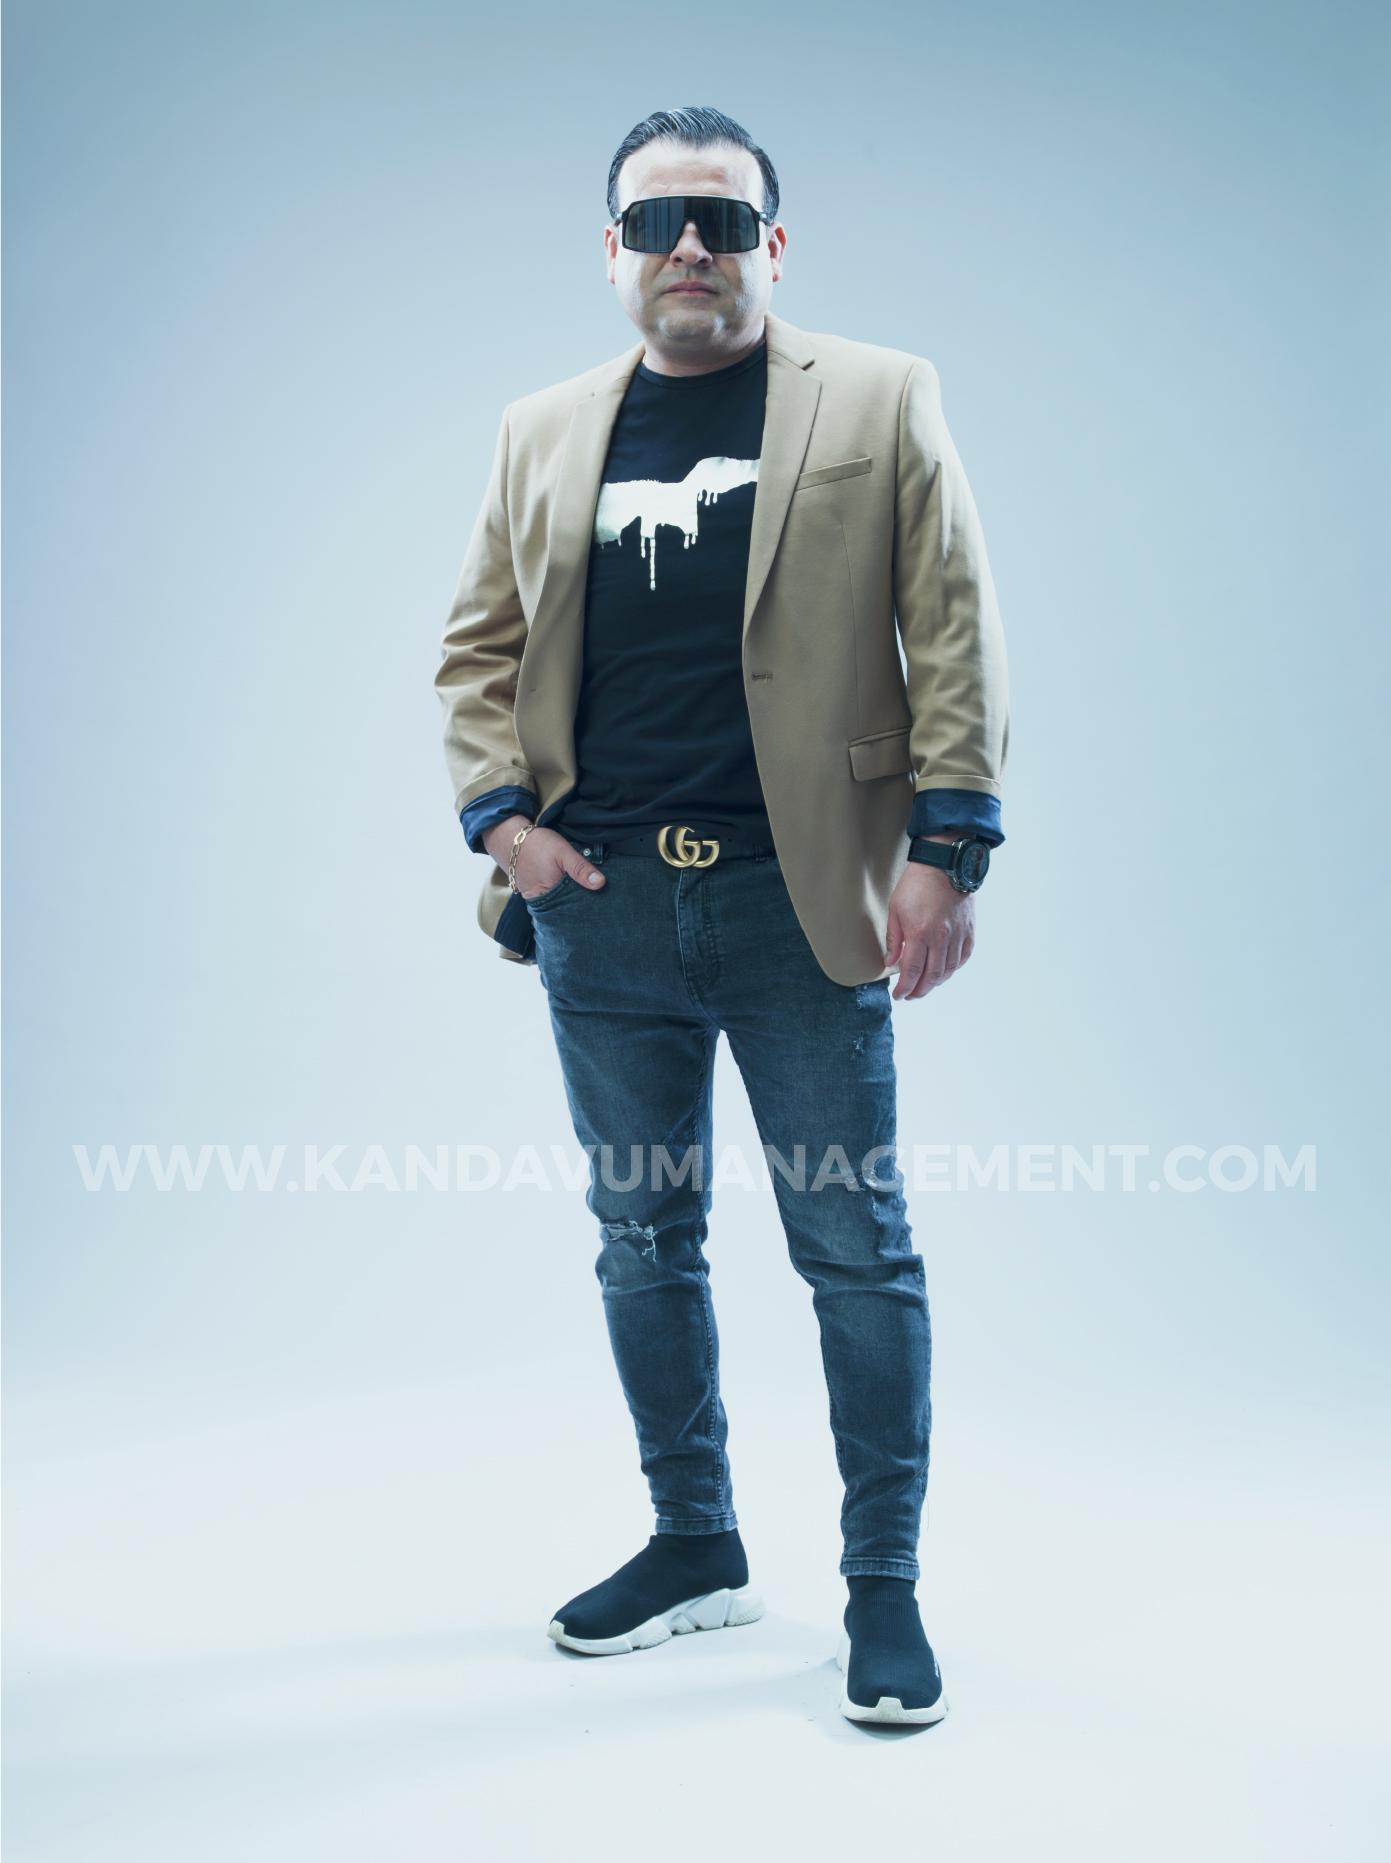 Juan Carlos Orderique | Kandavu Management